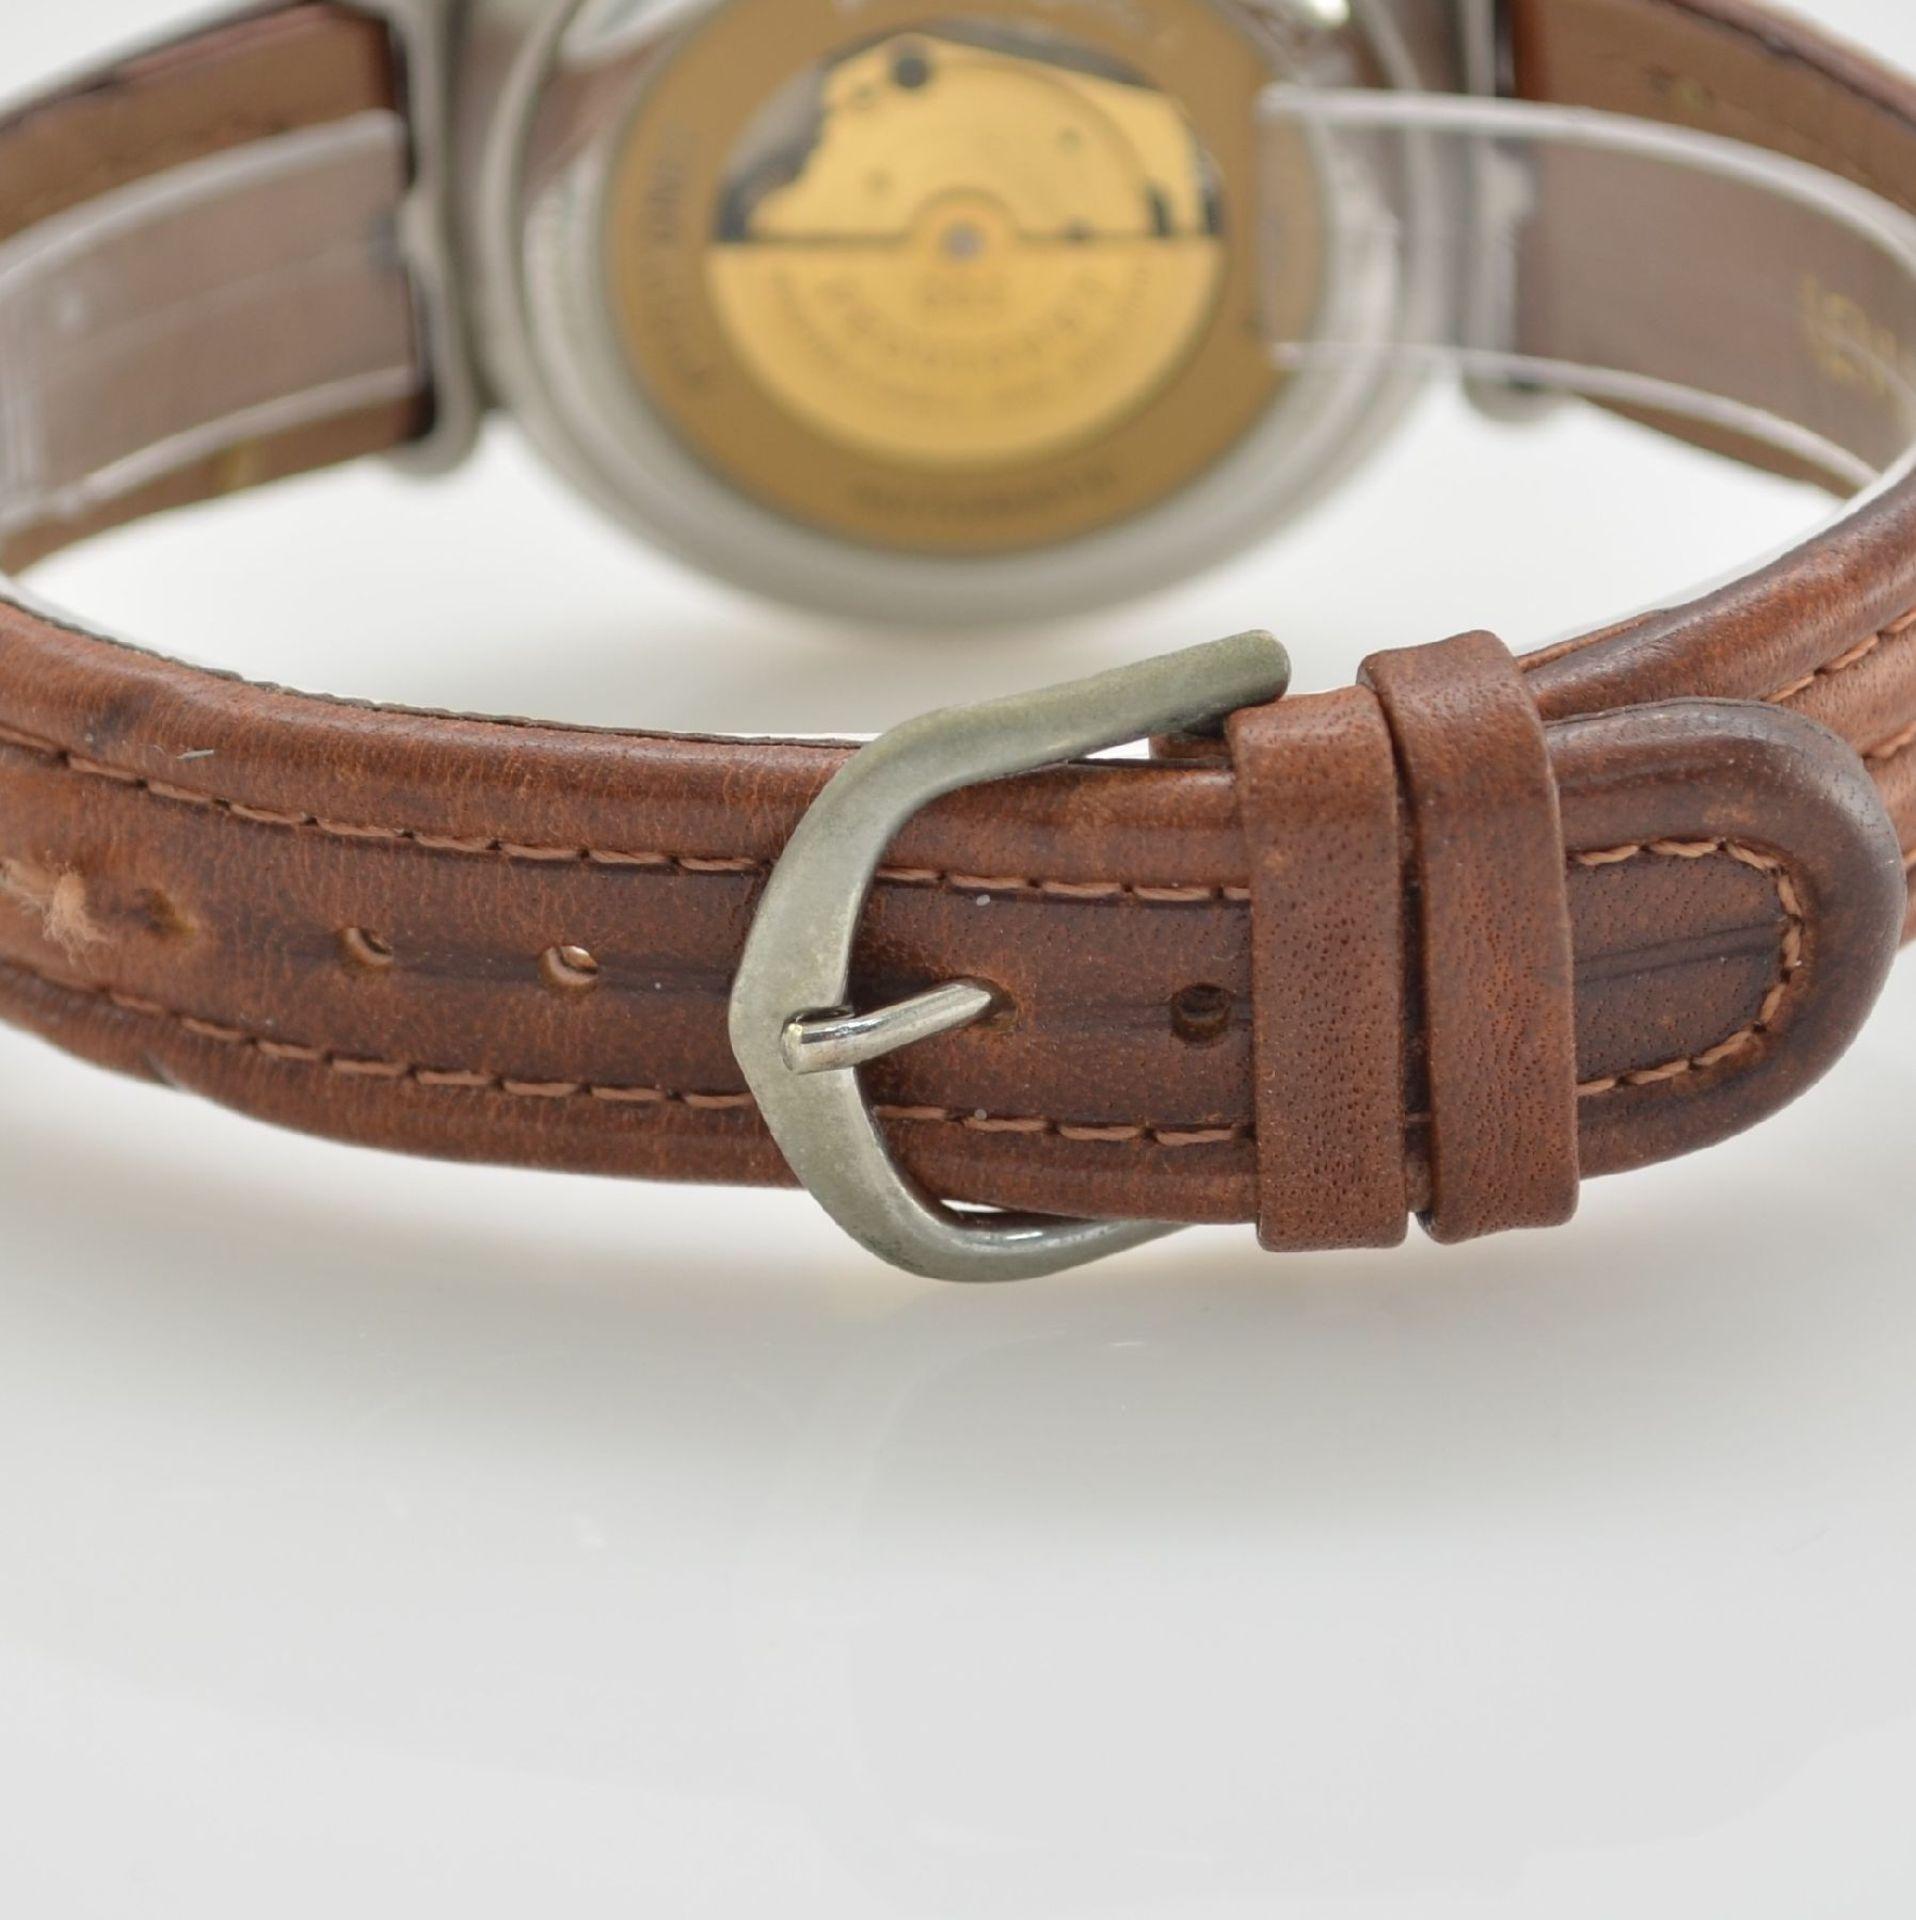 BUCHERER Chronometer Herrenarmbanduhr Archimedes in Edelstahl, Automatik, Gliederband m. dopp. - Bild 5 aus 7